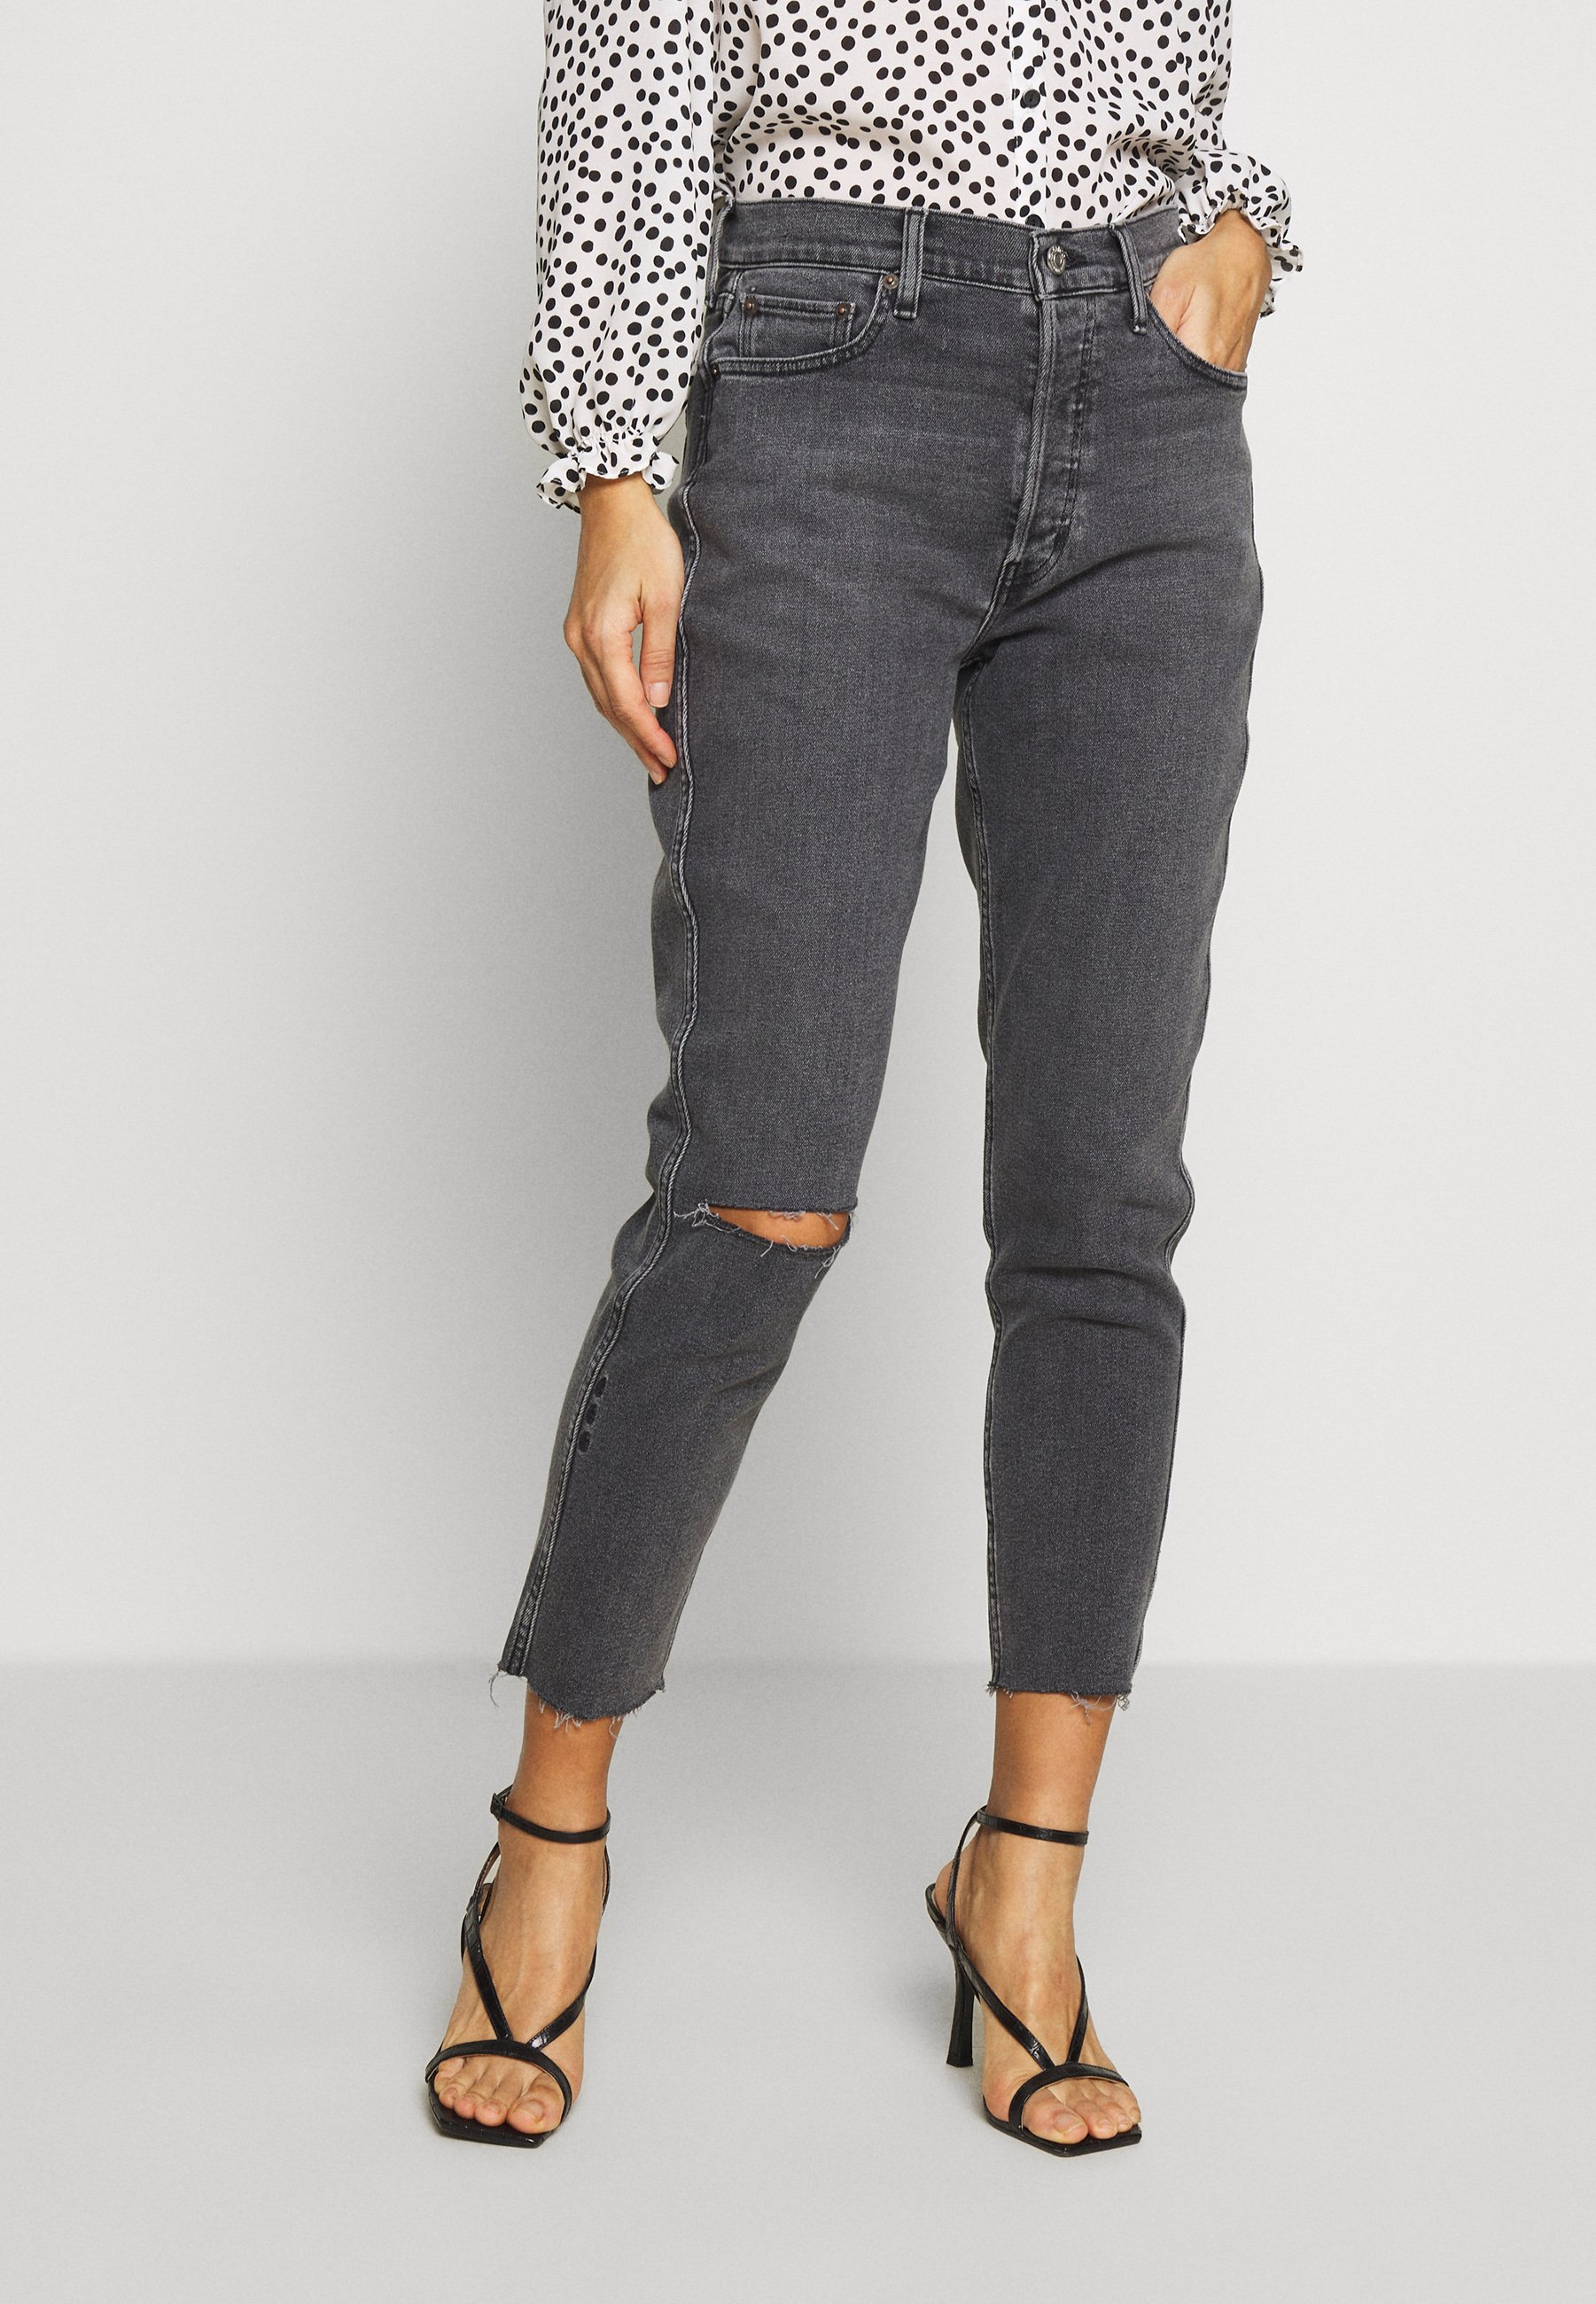 Ordine Abbigliamento da donna Ética ALEX ANKLE Jeans Tapered Fit black denim